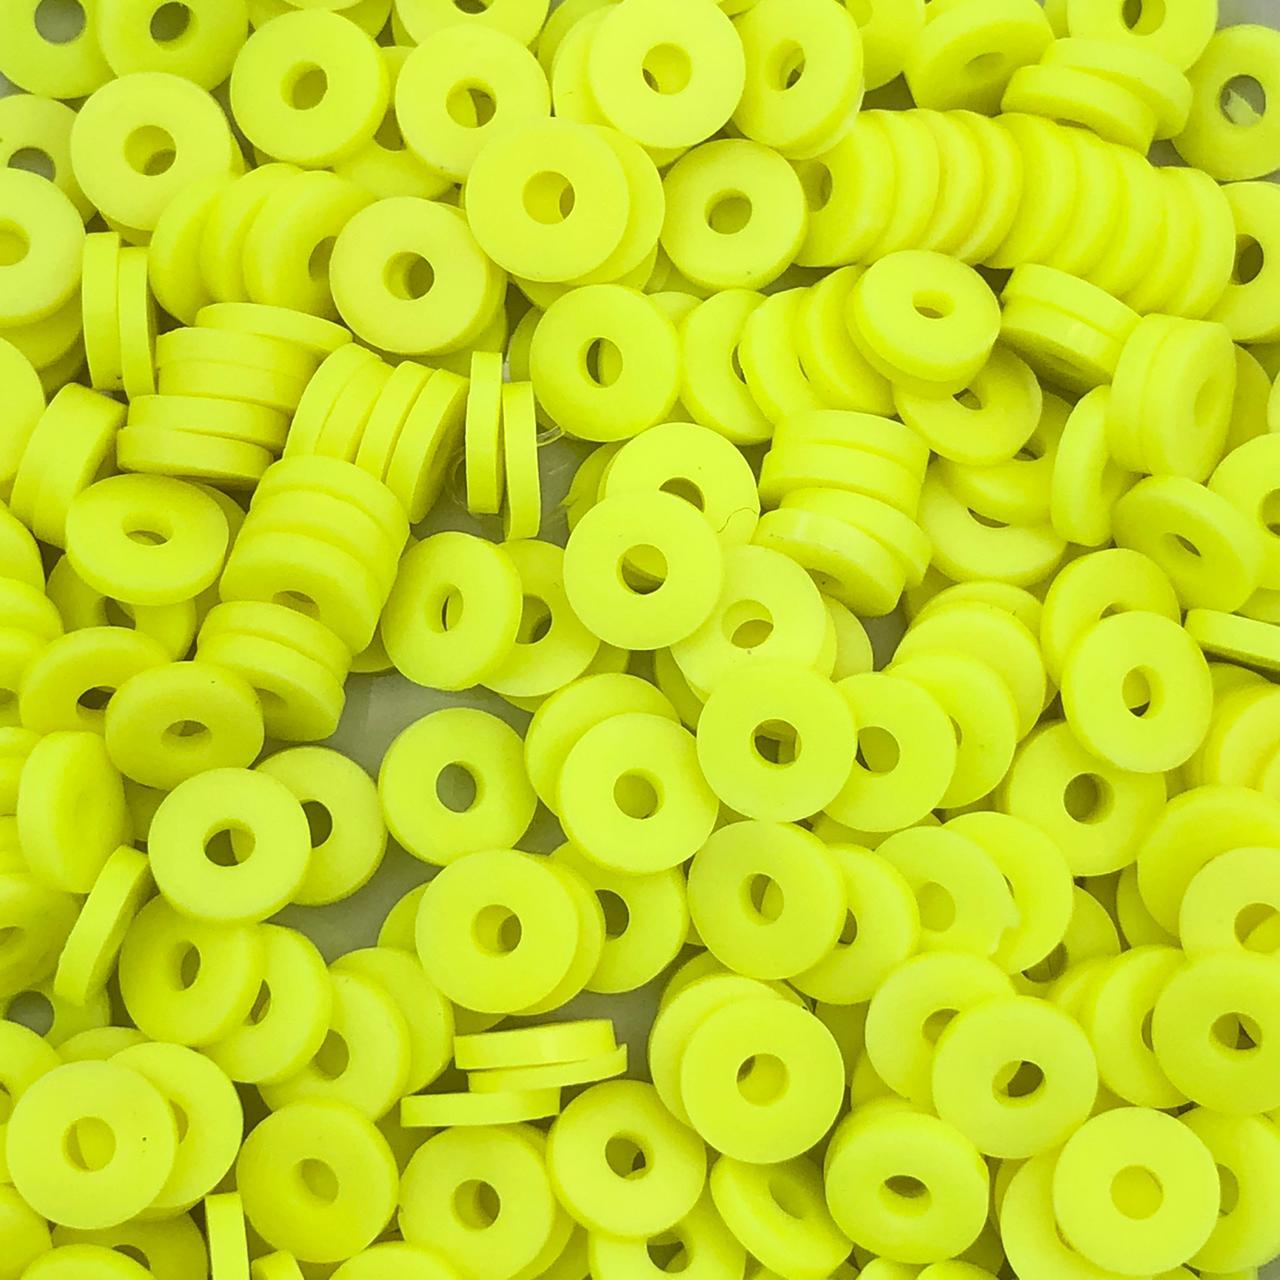 DF05 - Disco Fimo Emborrachado Amarelo Neon 6mm - 01Fio